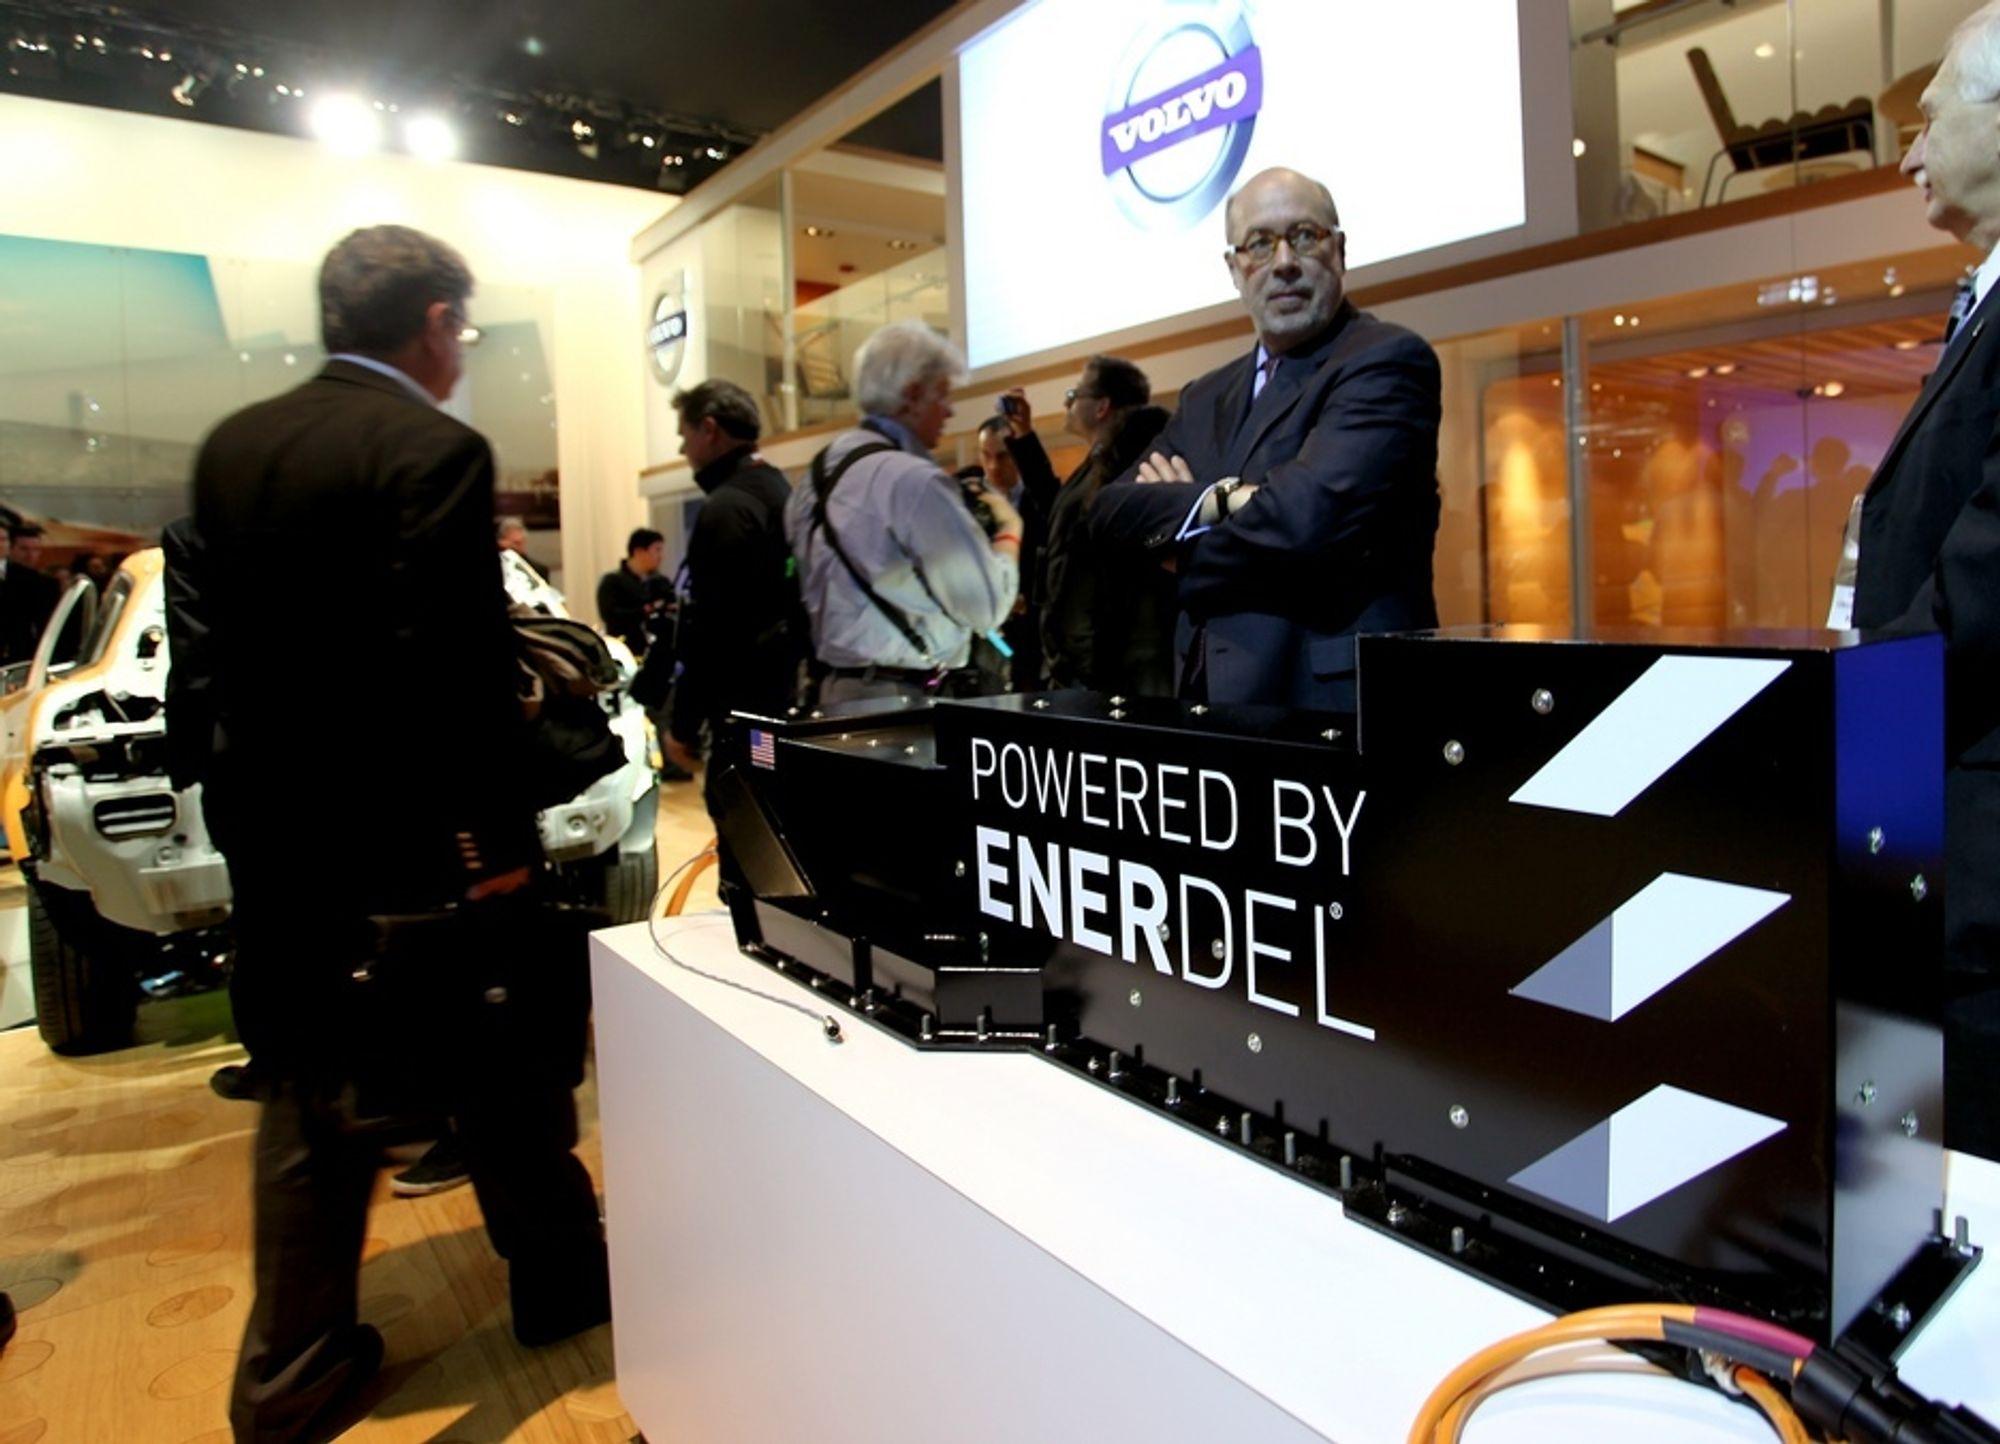 EnerDel, datterselskapet til Ener1, leverer batterier til flere elbiler, også Volvo C30 electric.